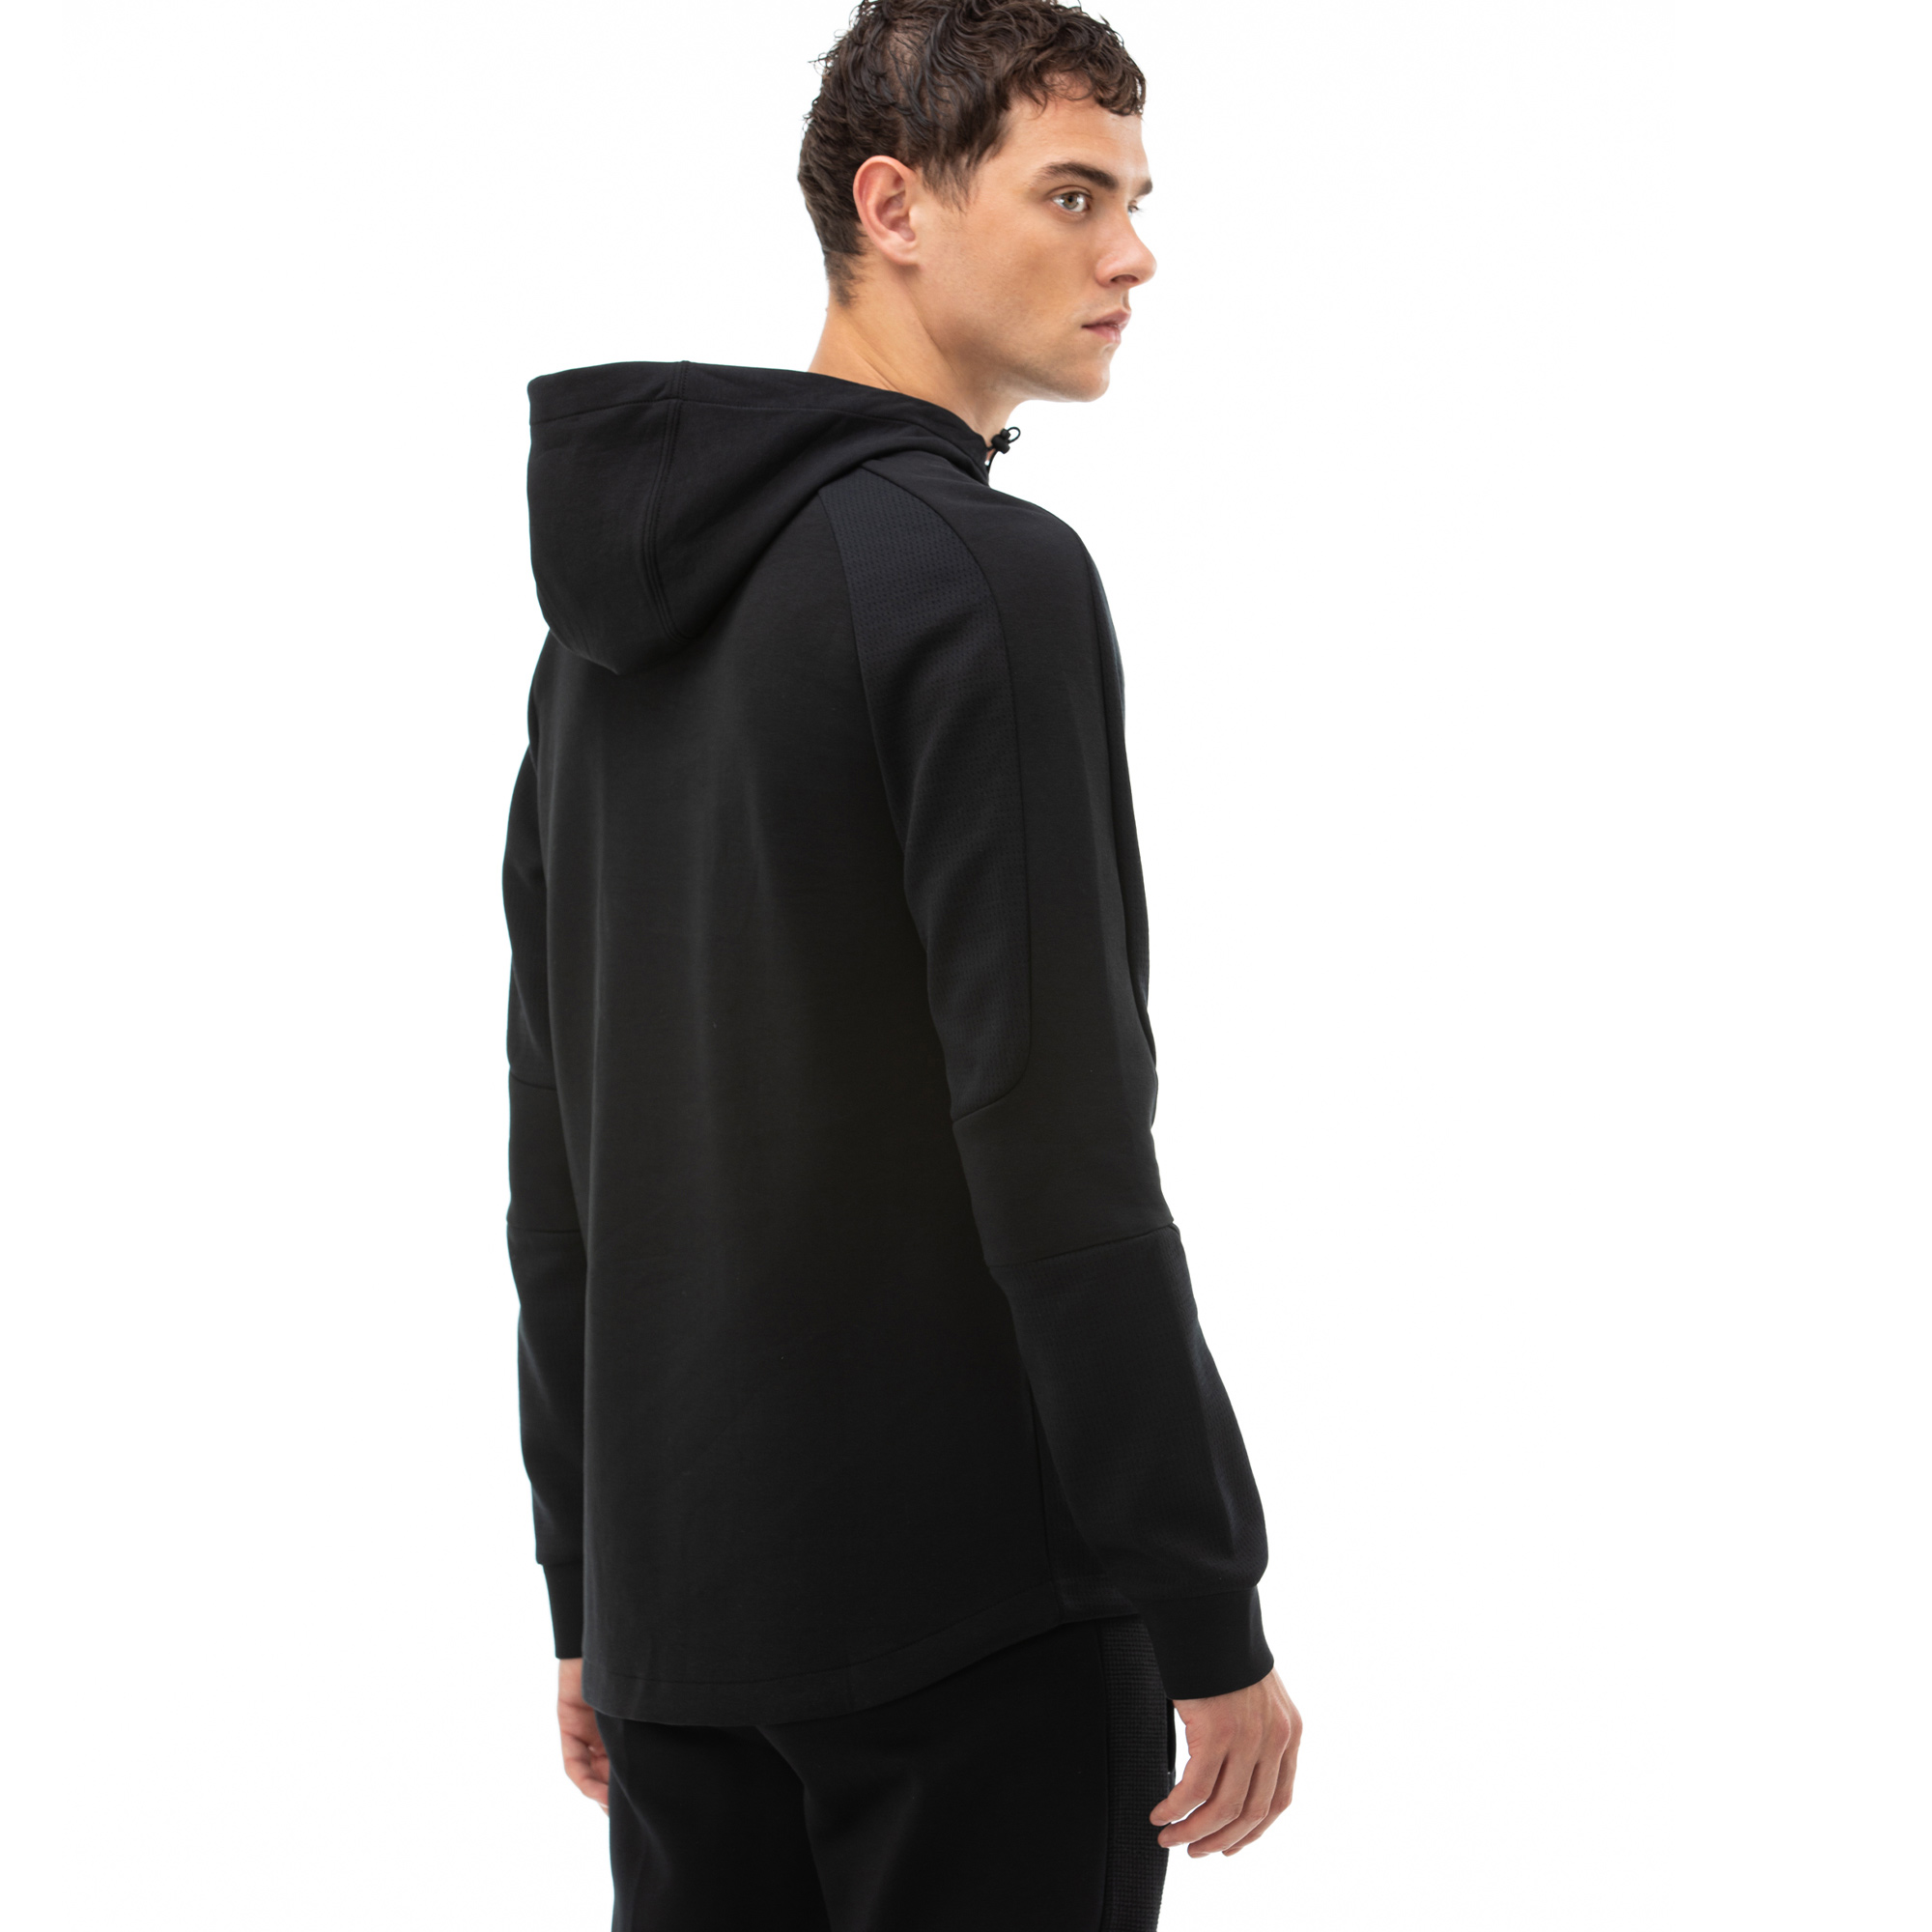 Puma Evostripe Erkek Siyah Sweatshirt